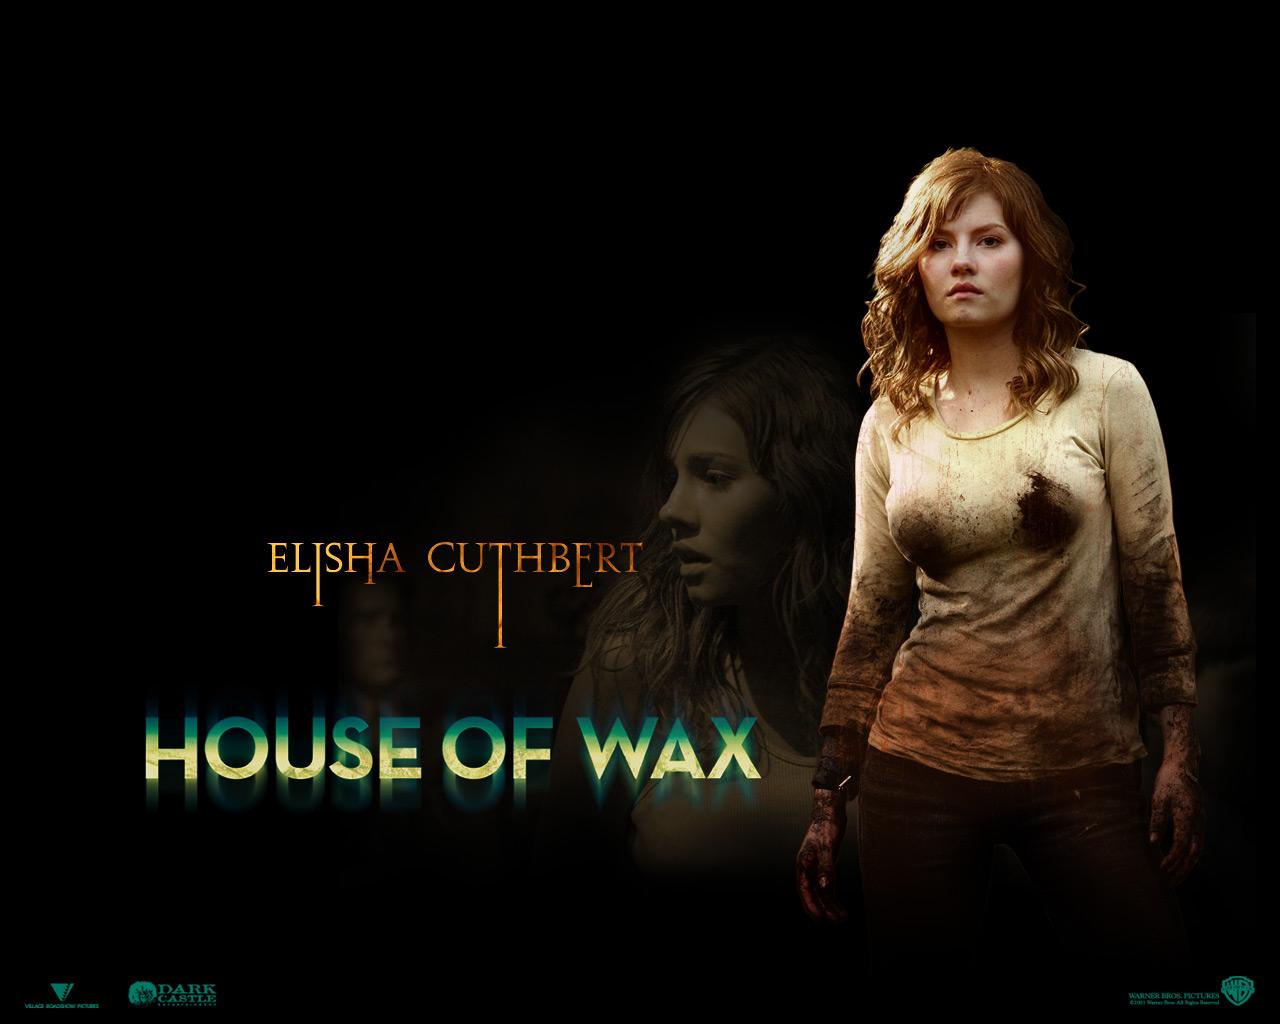 house of wax 2